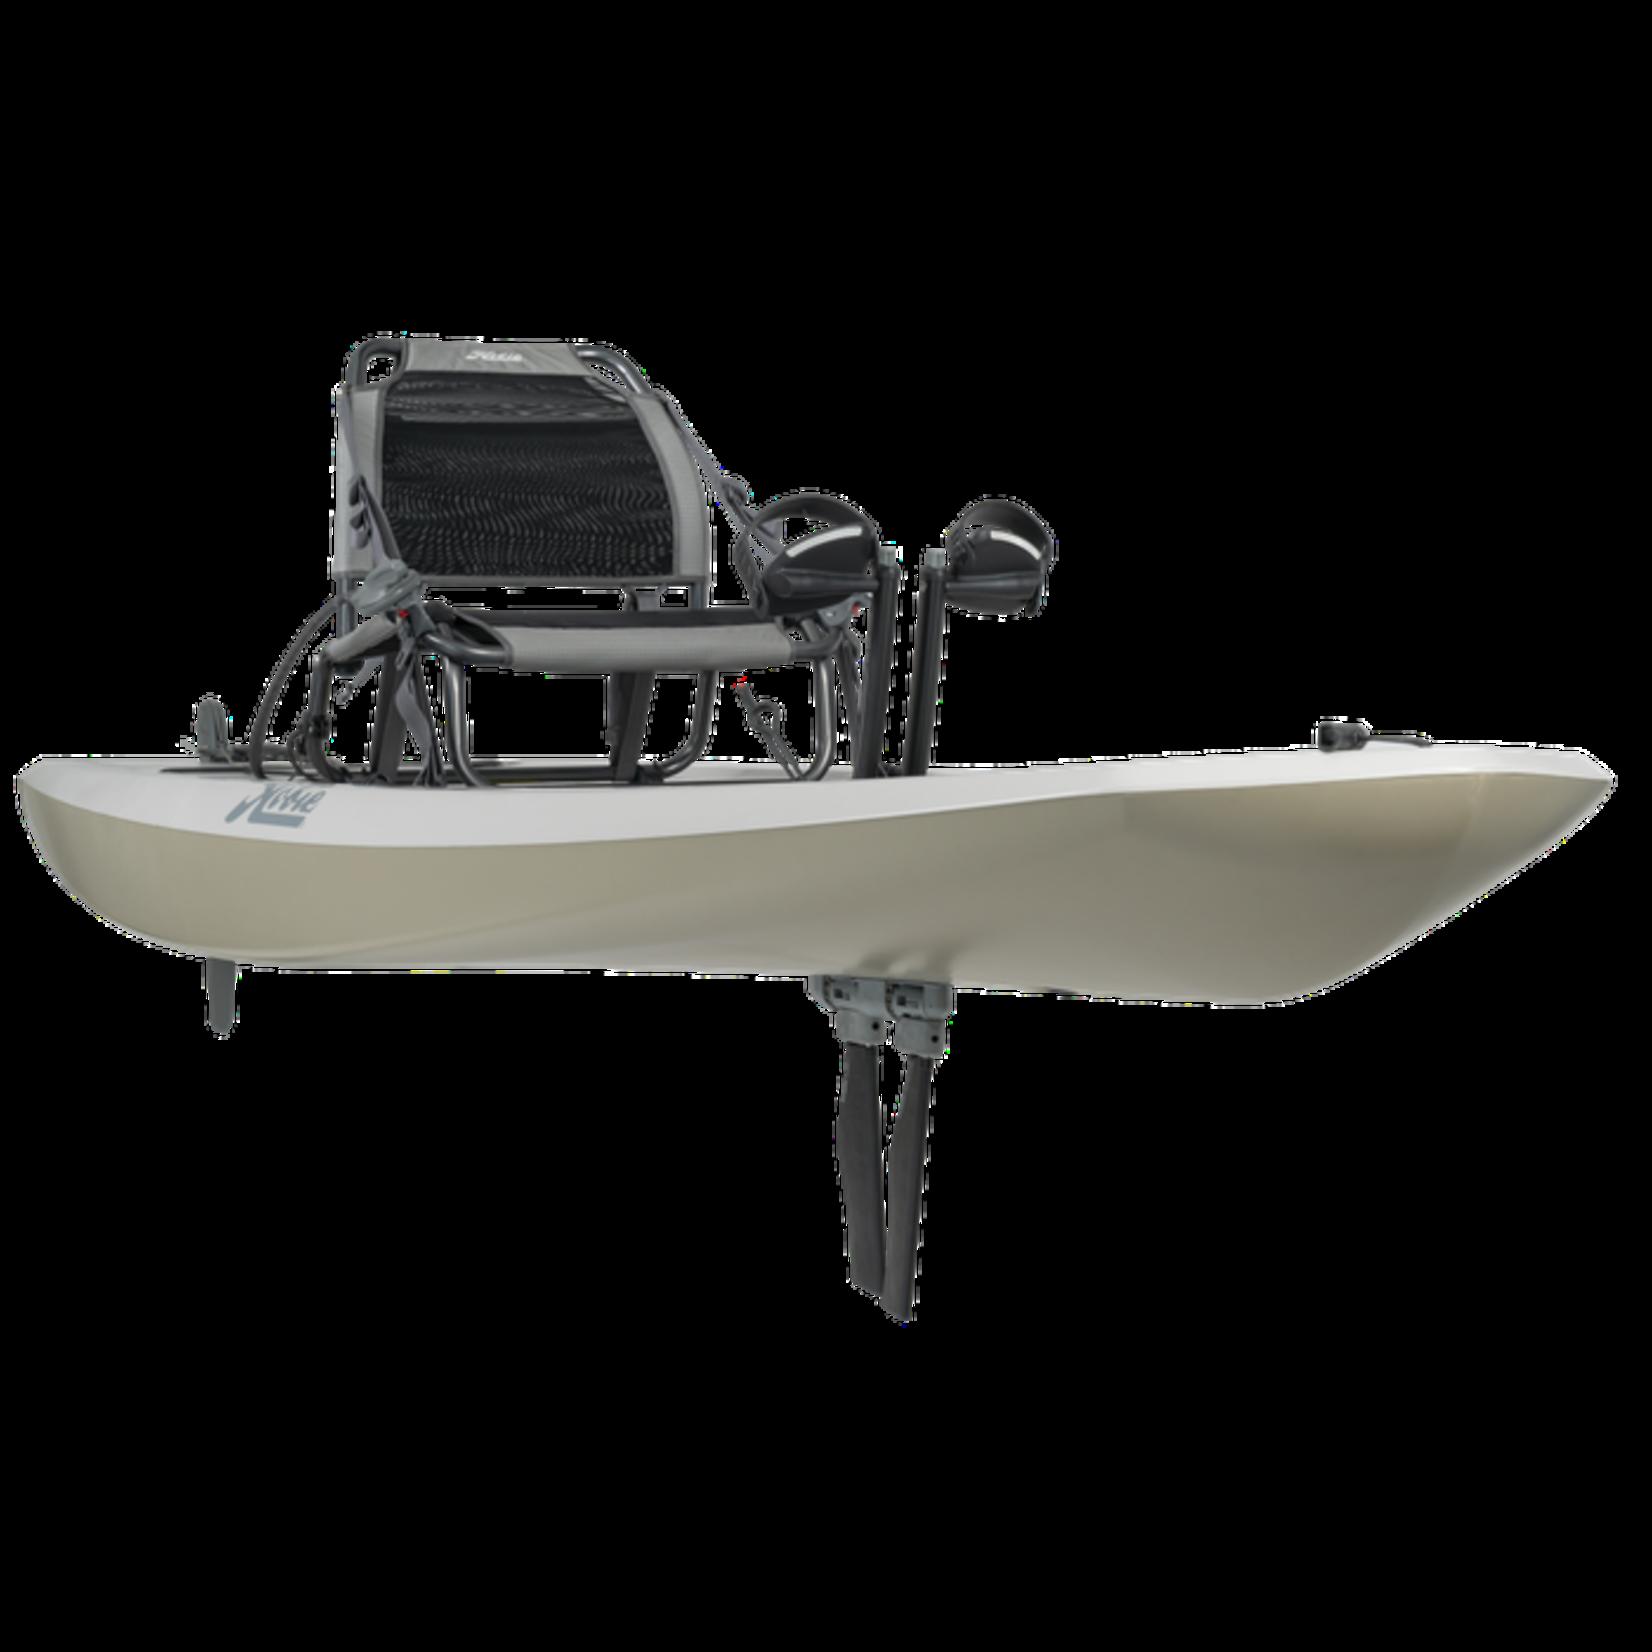 Hobie Kayaks Hobie Mirage Lynx 11